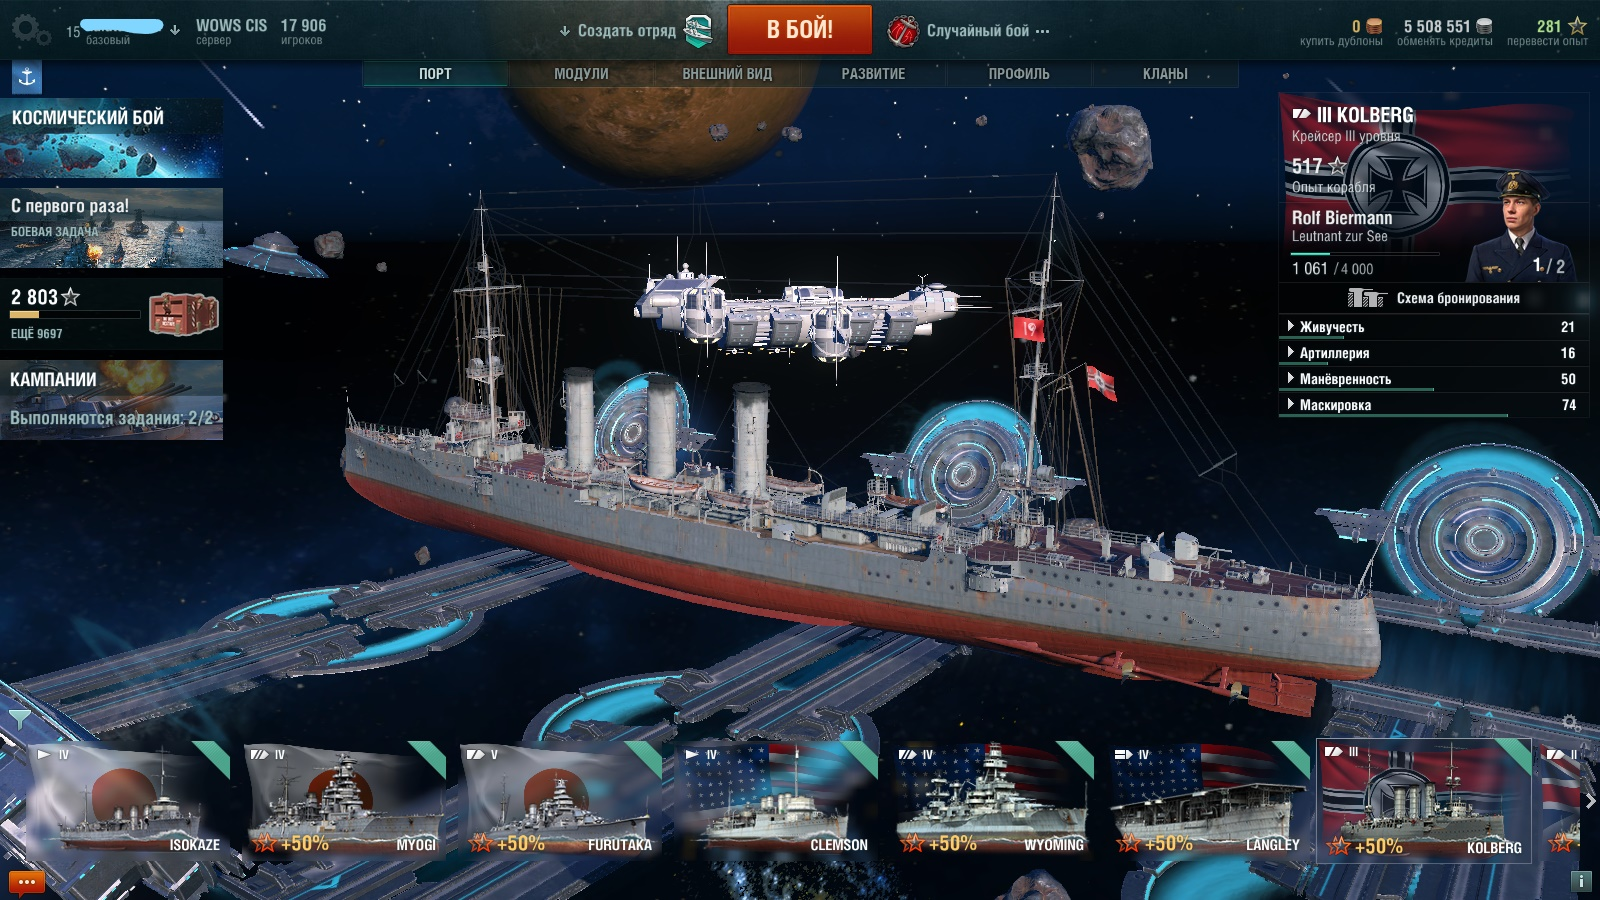 World of Warships Screenshot 2018.03.31 - 02.07.22.70_LI.jpg - -